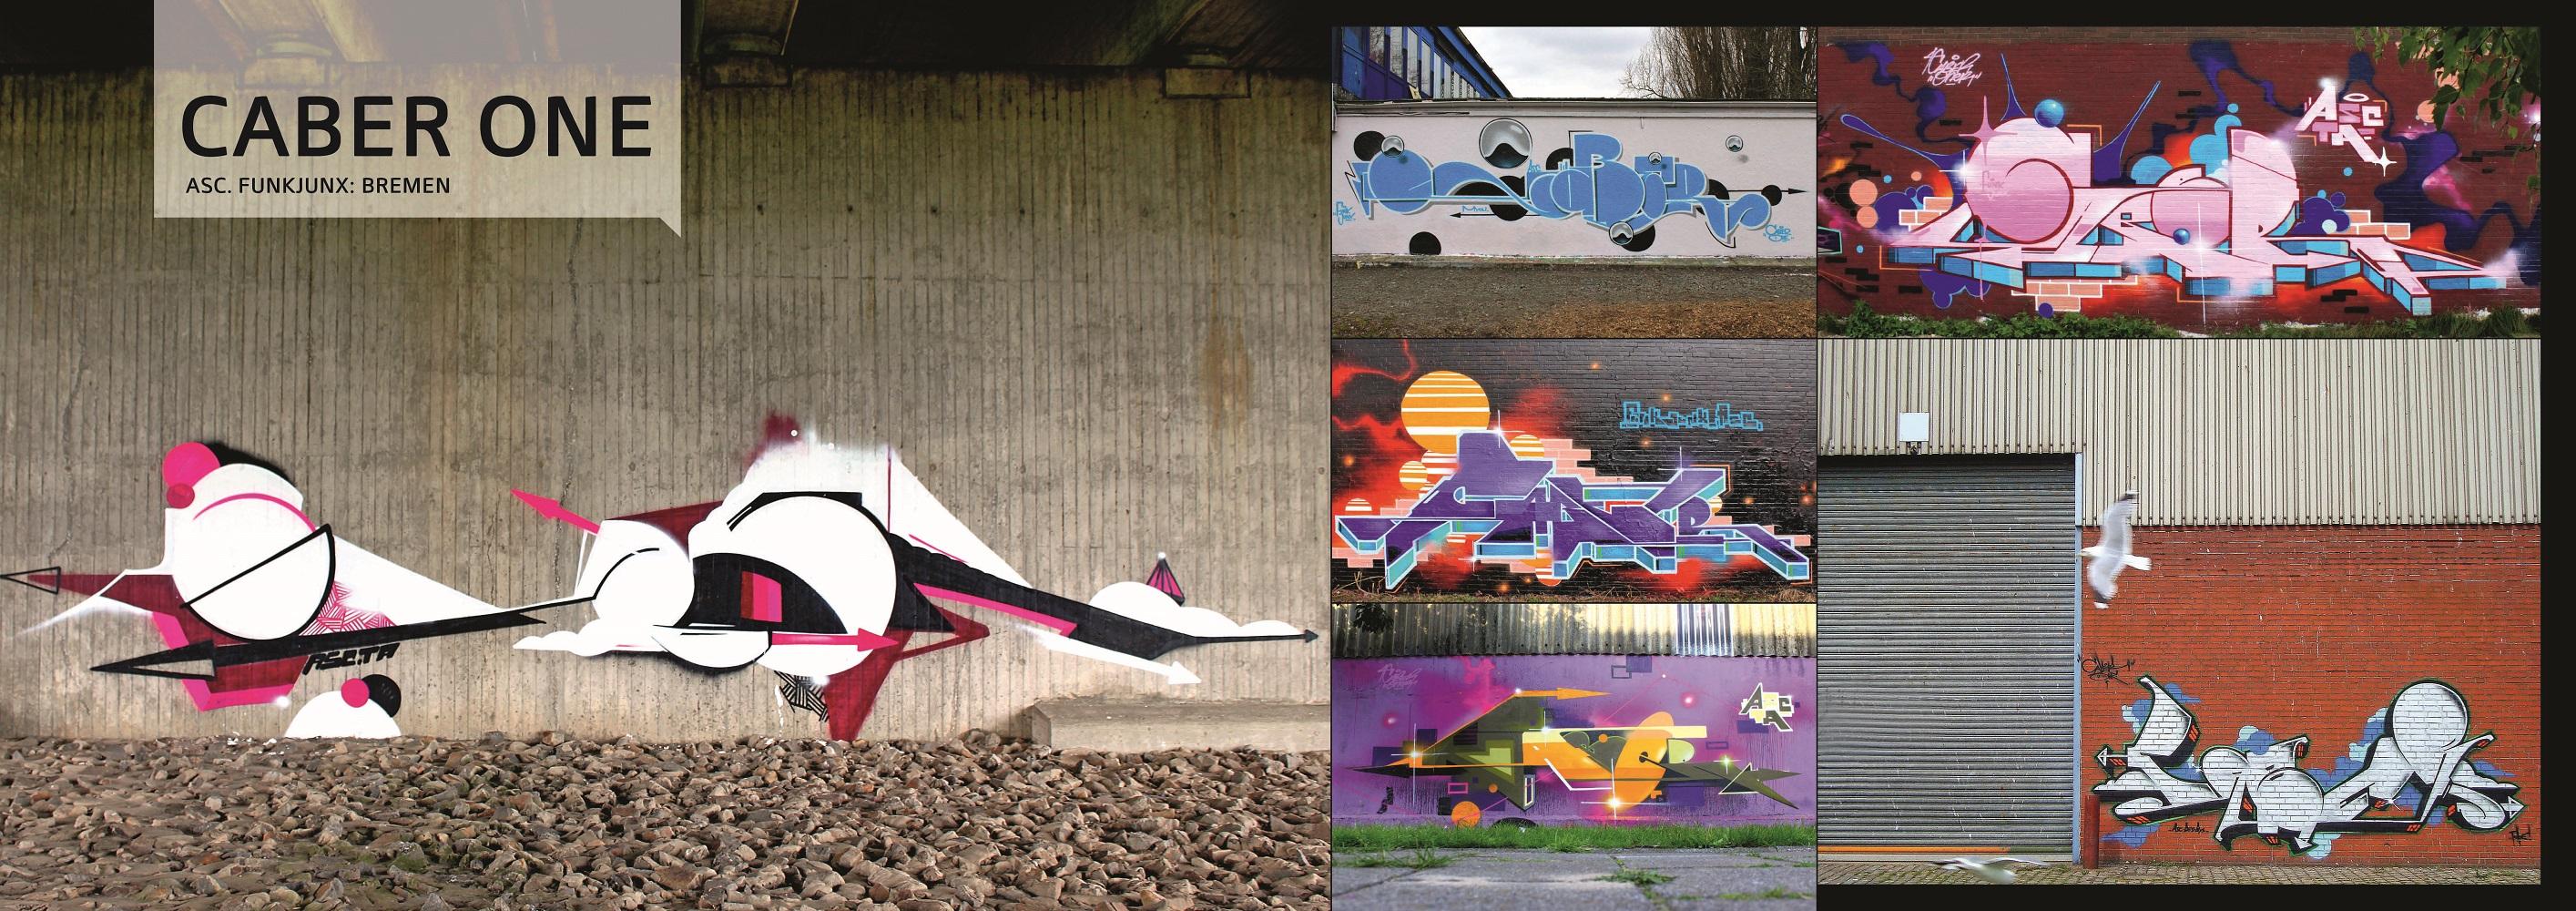 CABER ONE | ASC.FUNKJUNX | Bremen | Stylefile # 49 - Inkfile